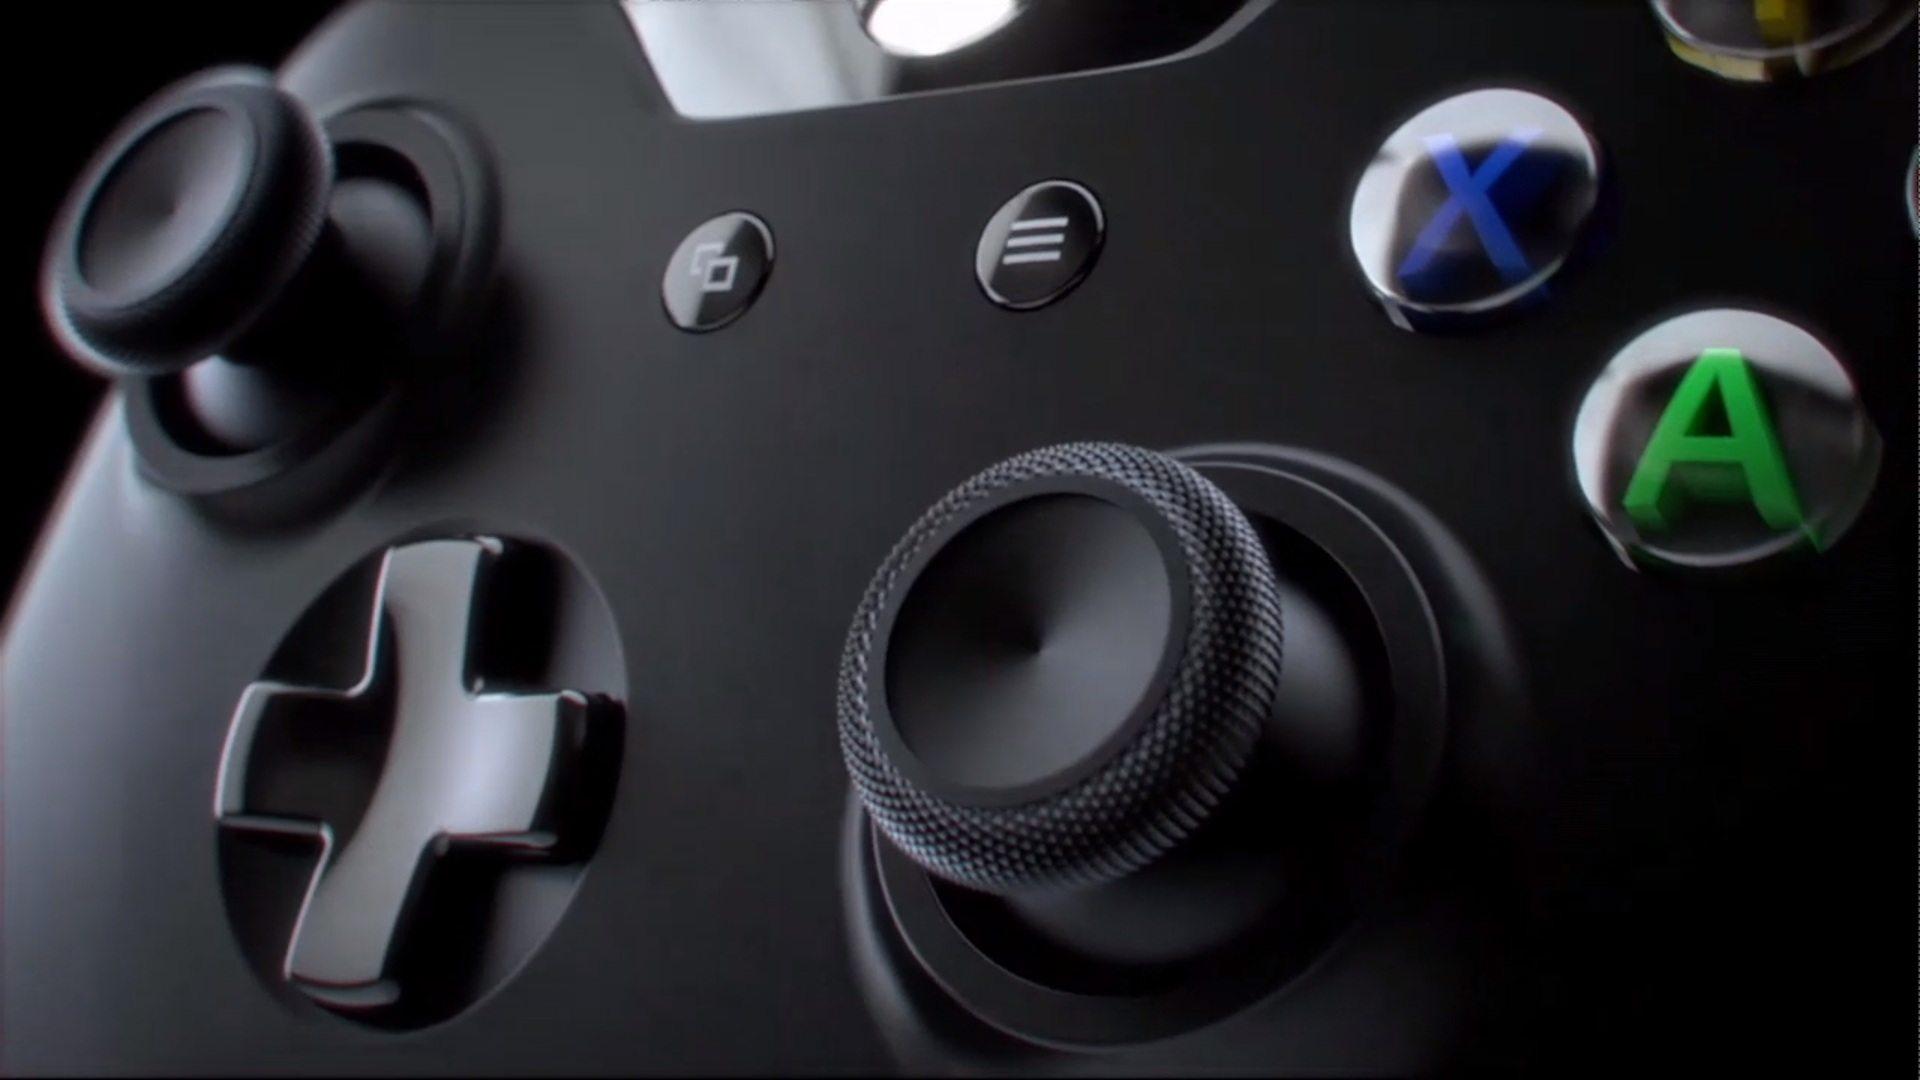 Xbox One Realtà Virtuale